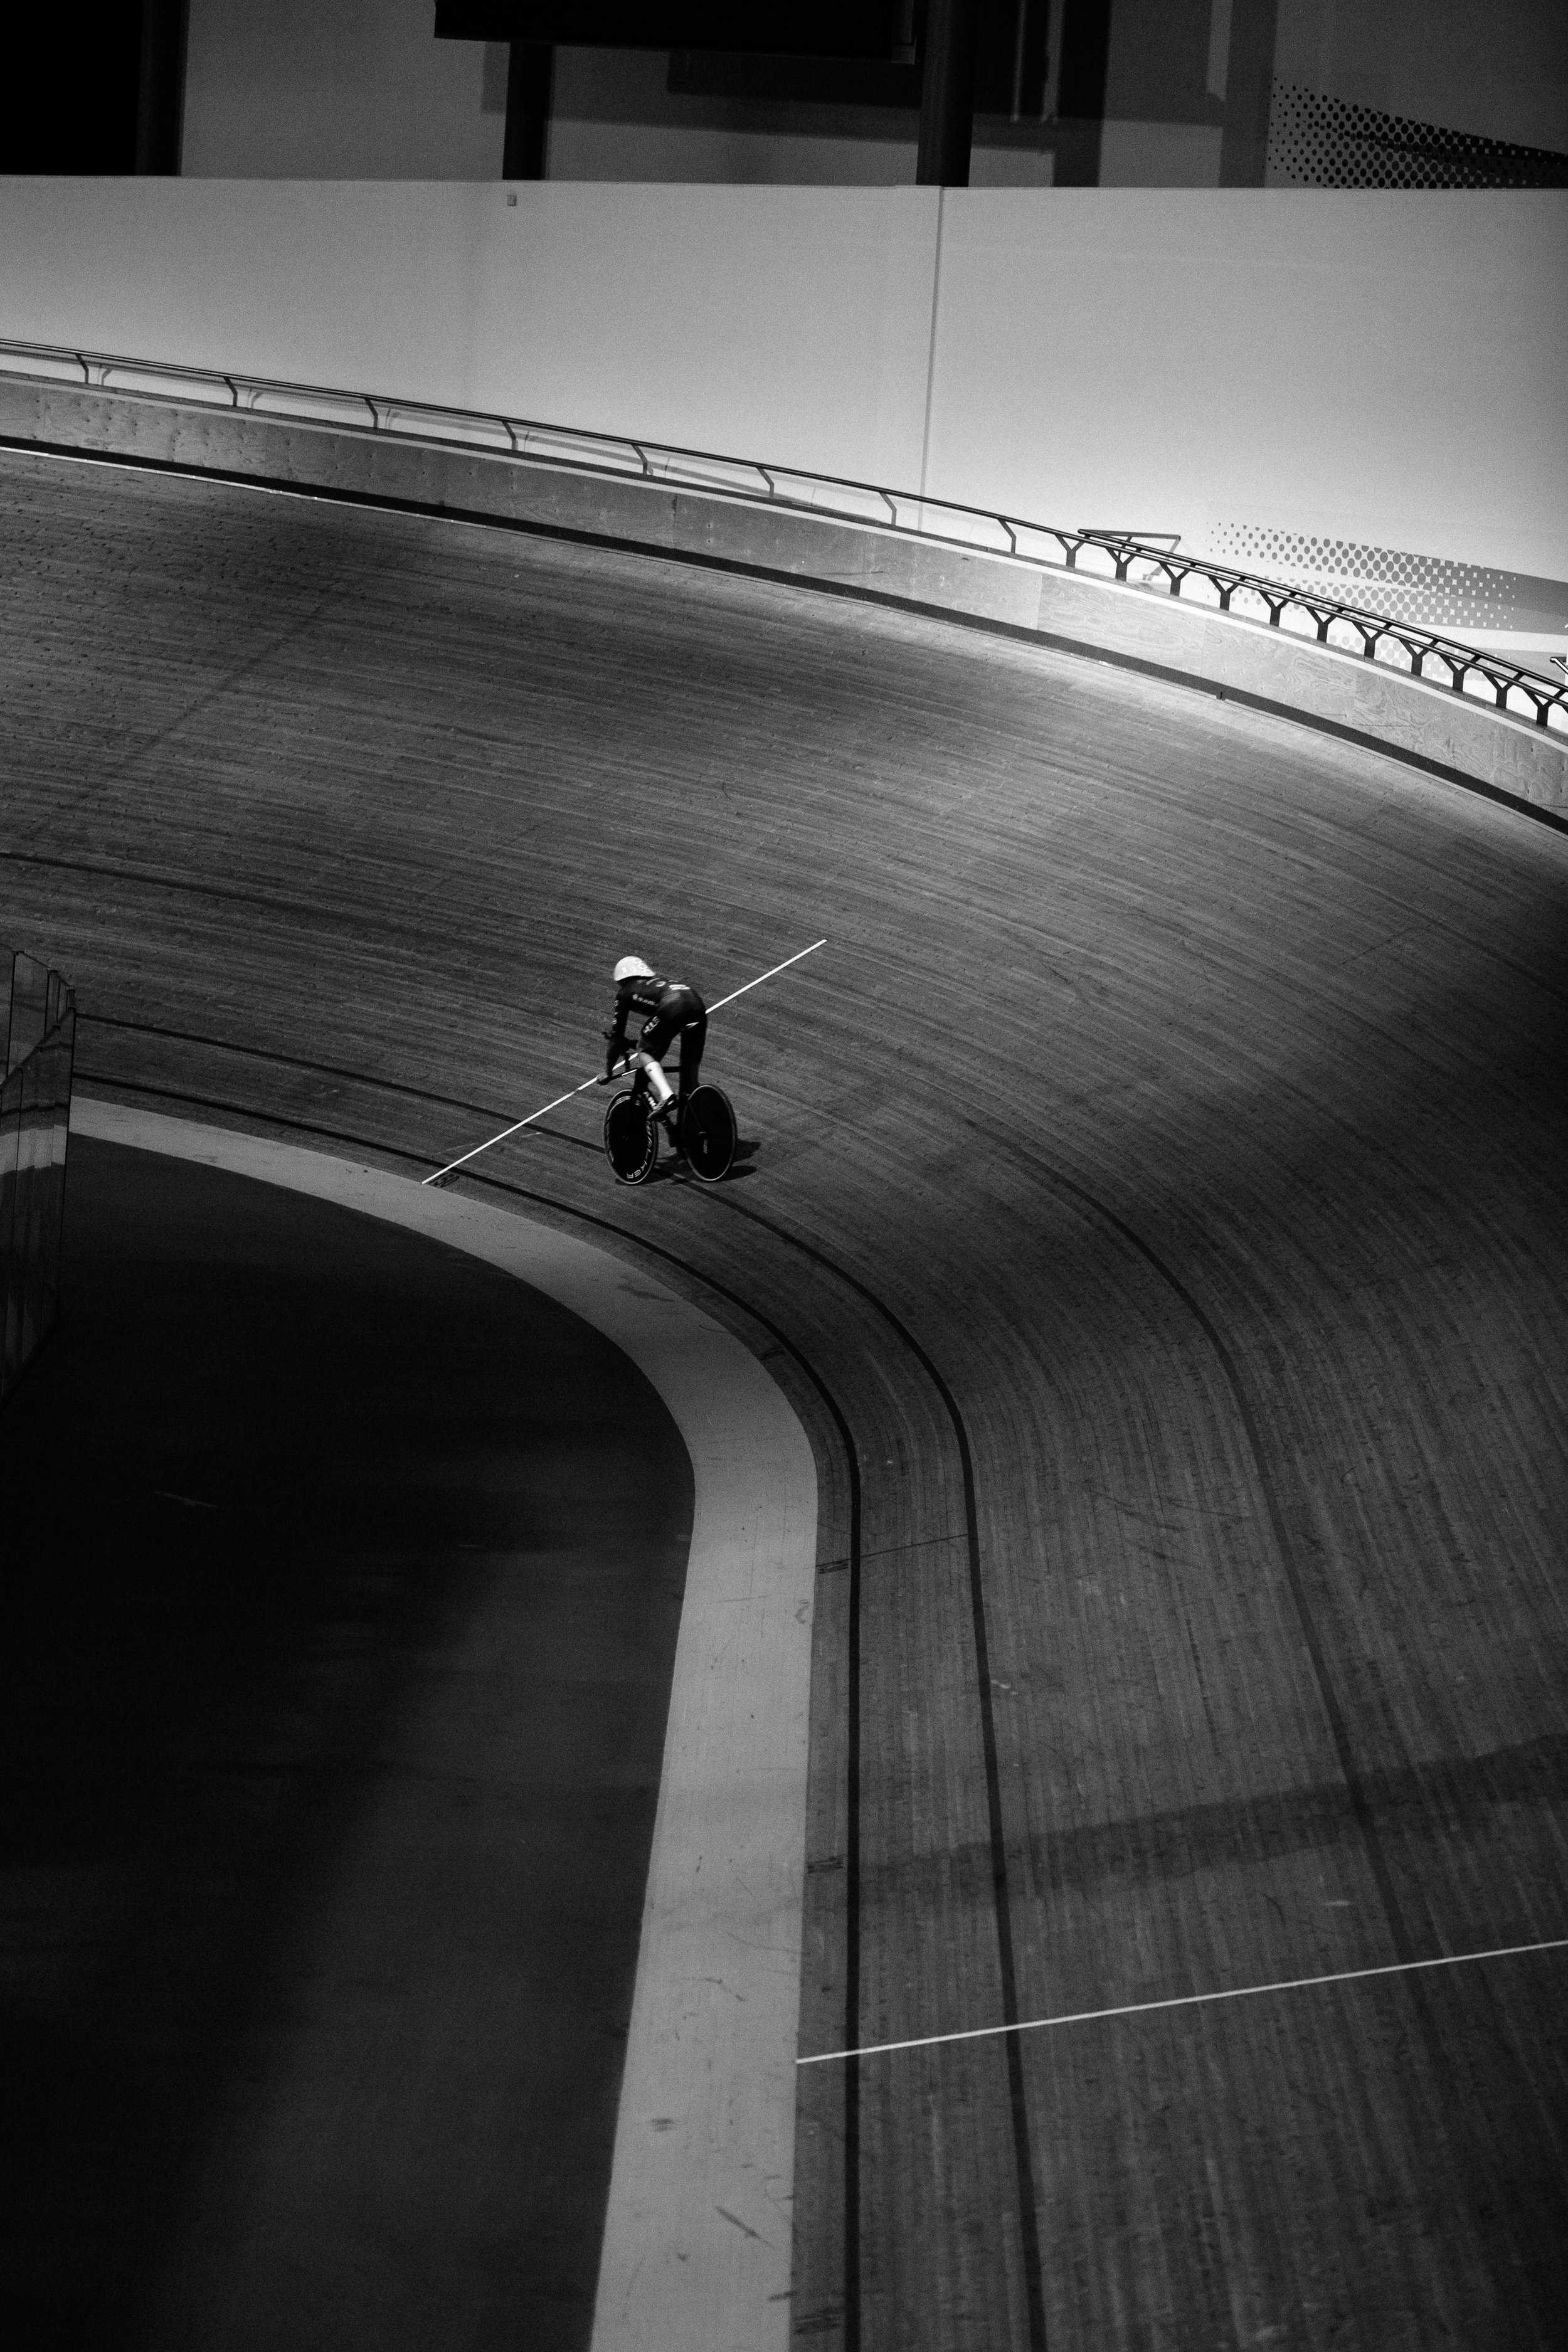 derby-velodrome-23.jpg